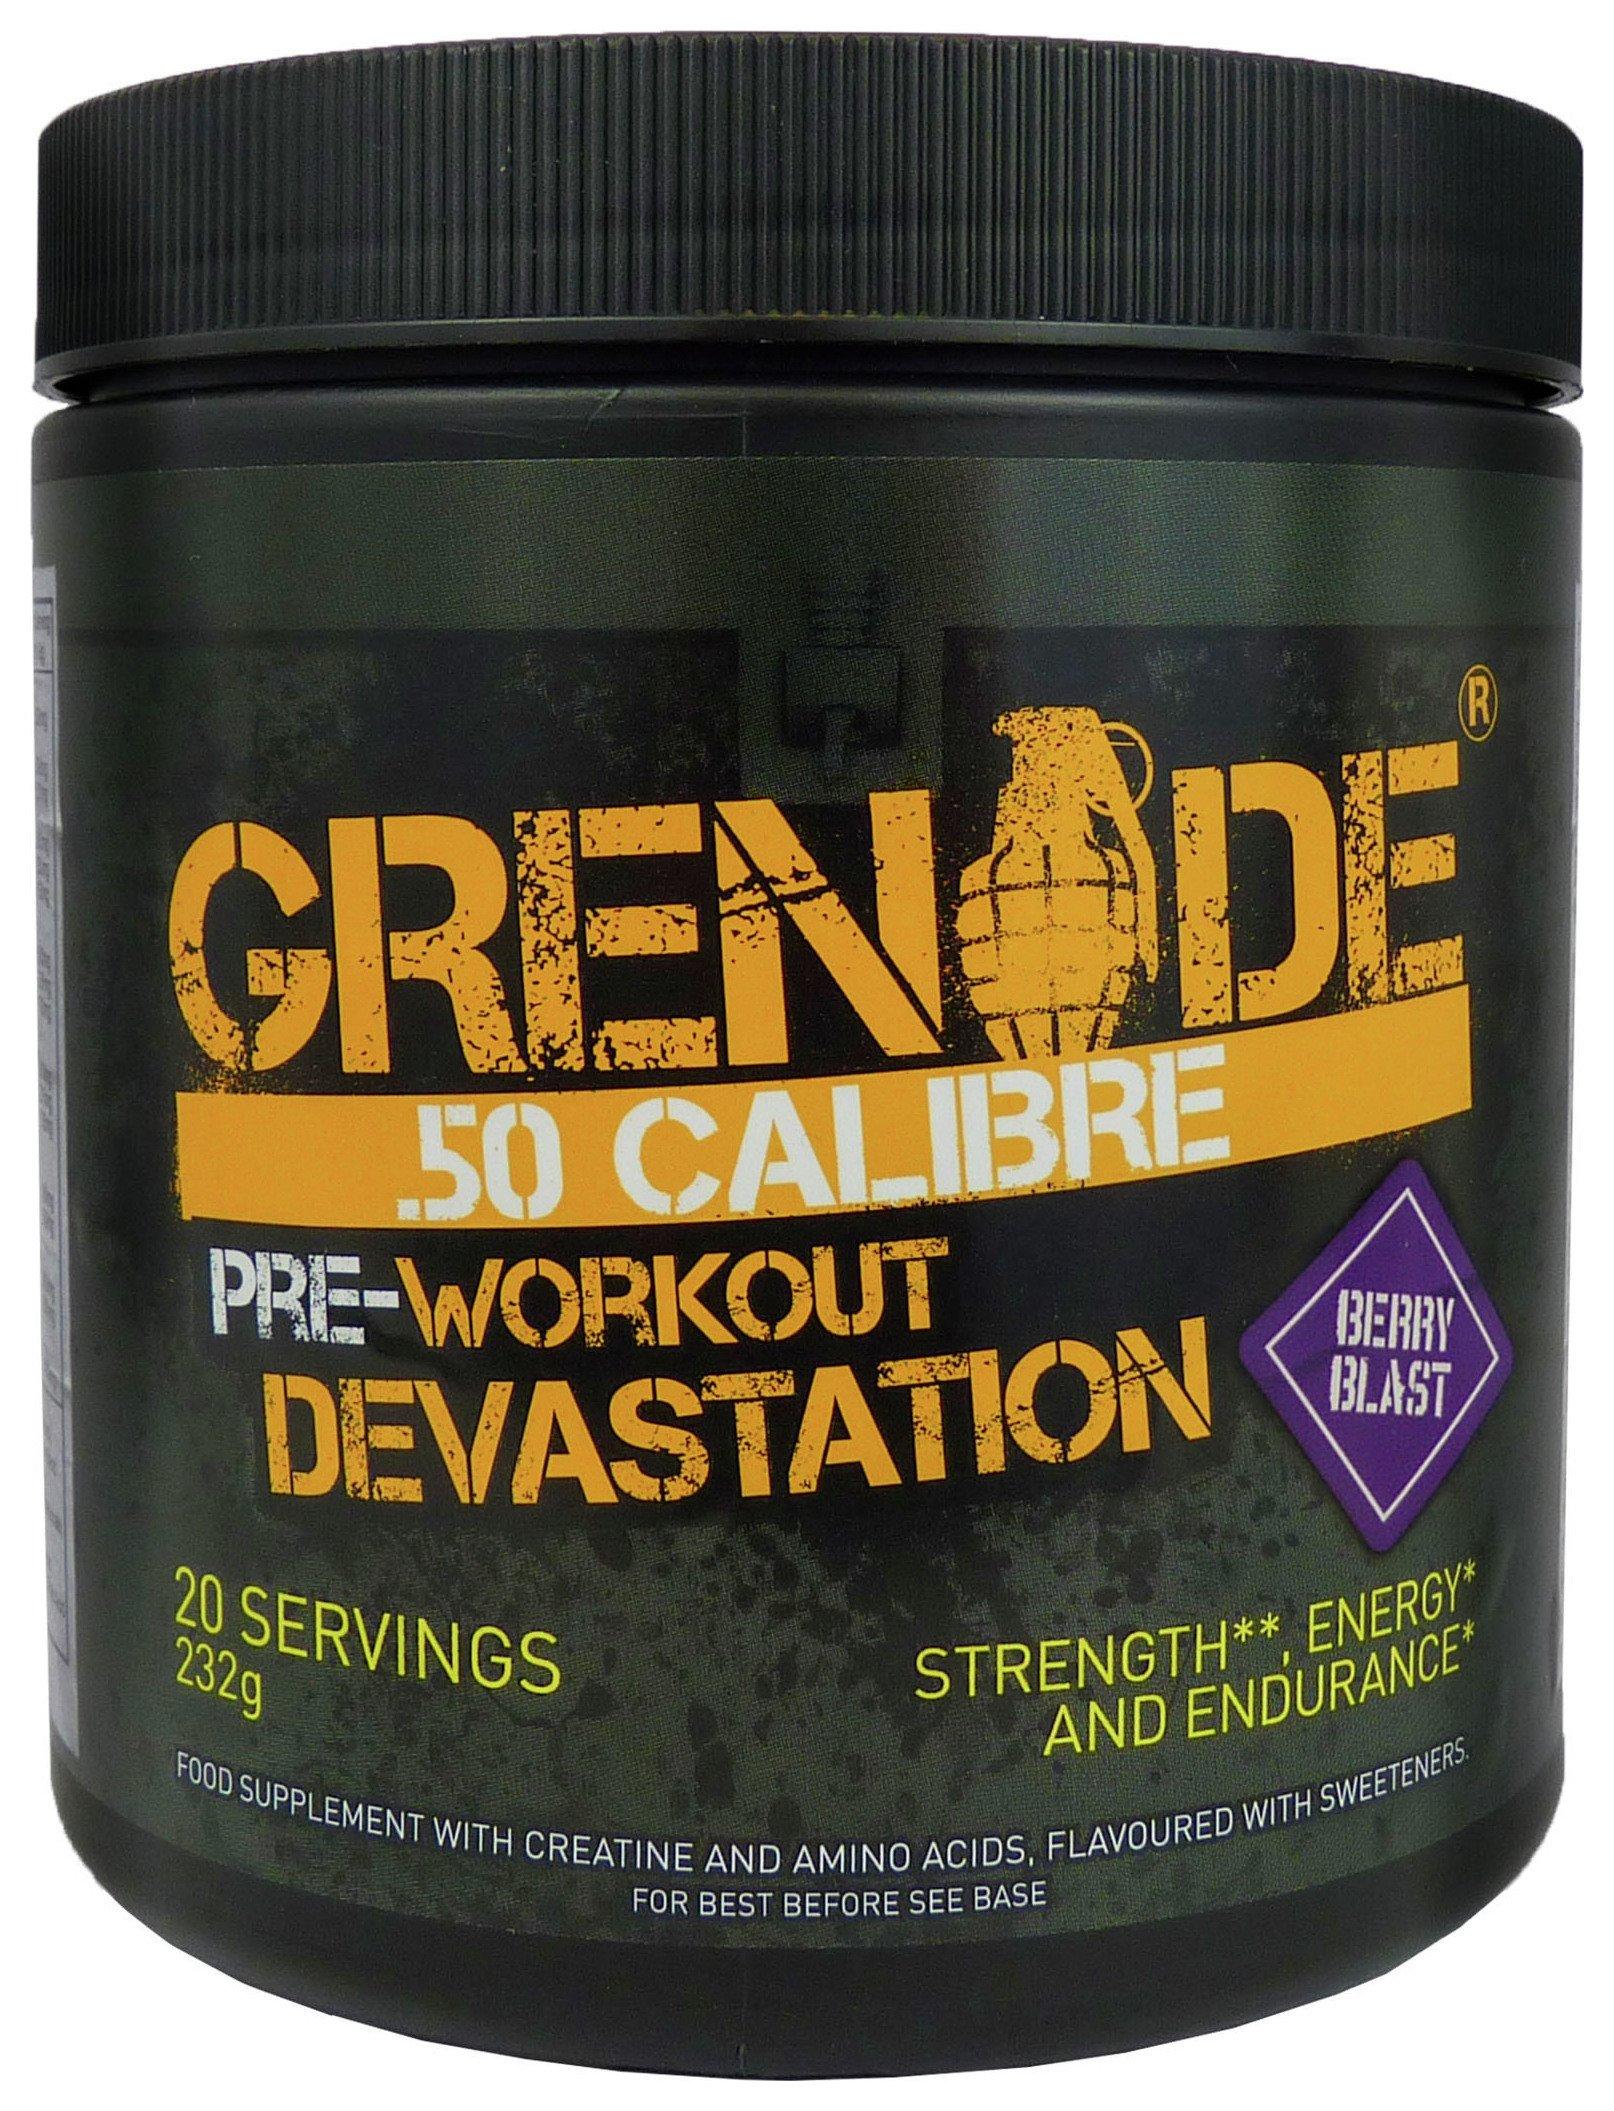 Image of Grenade - 50 Calibre 232g Sports Drink - Berry Blast